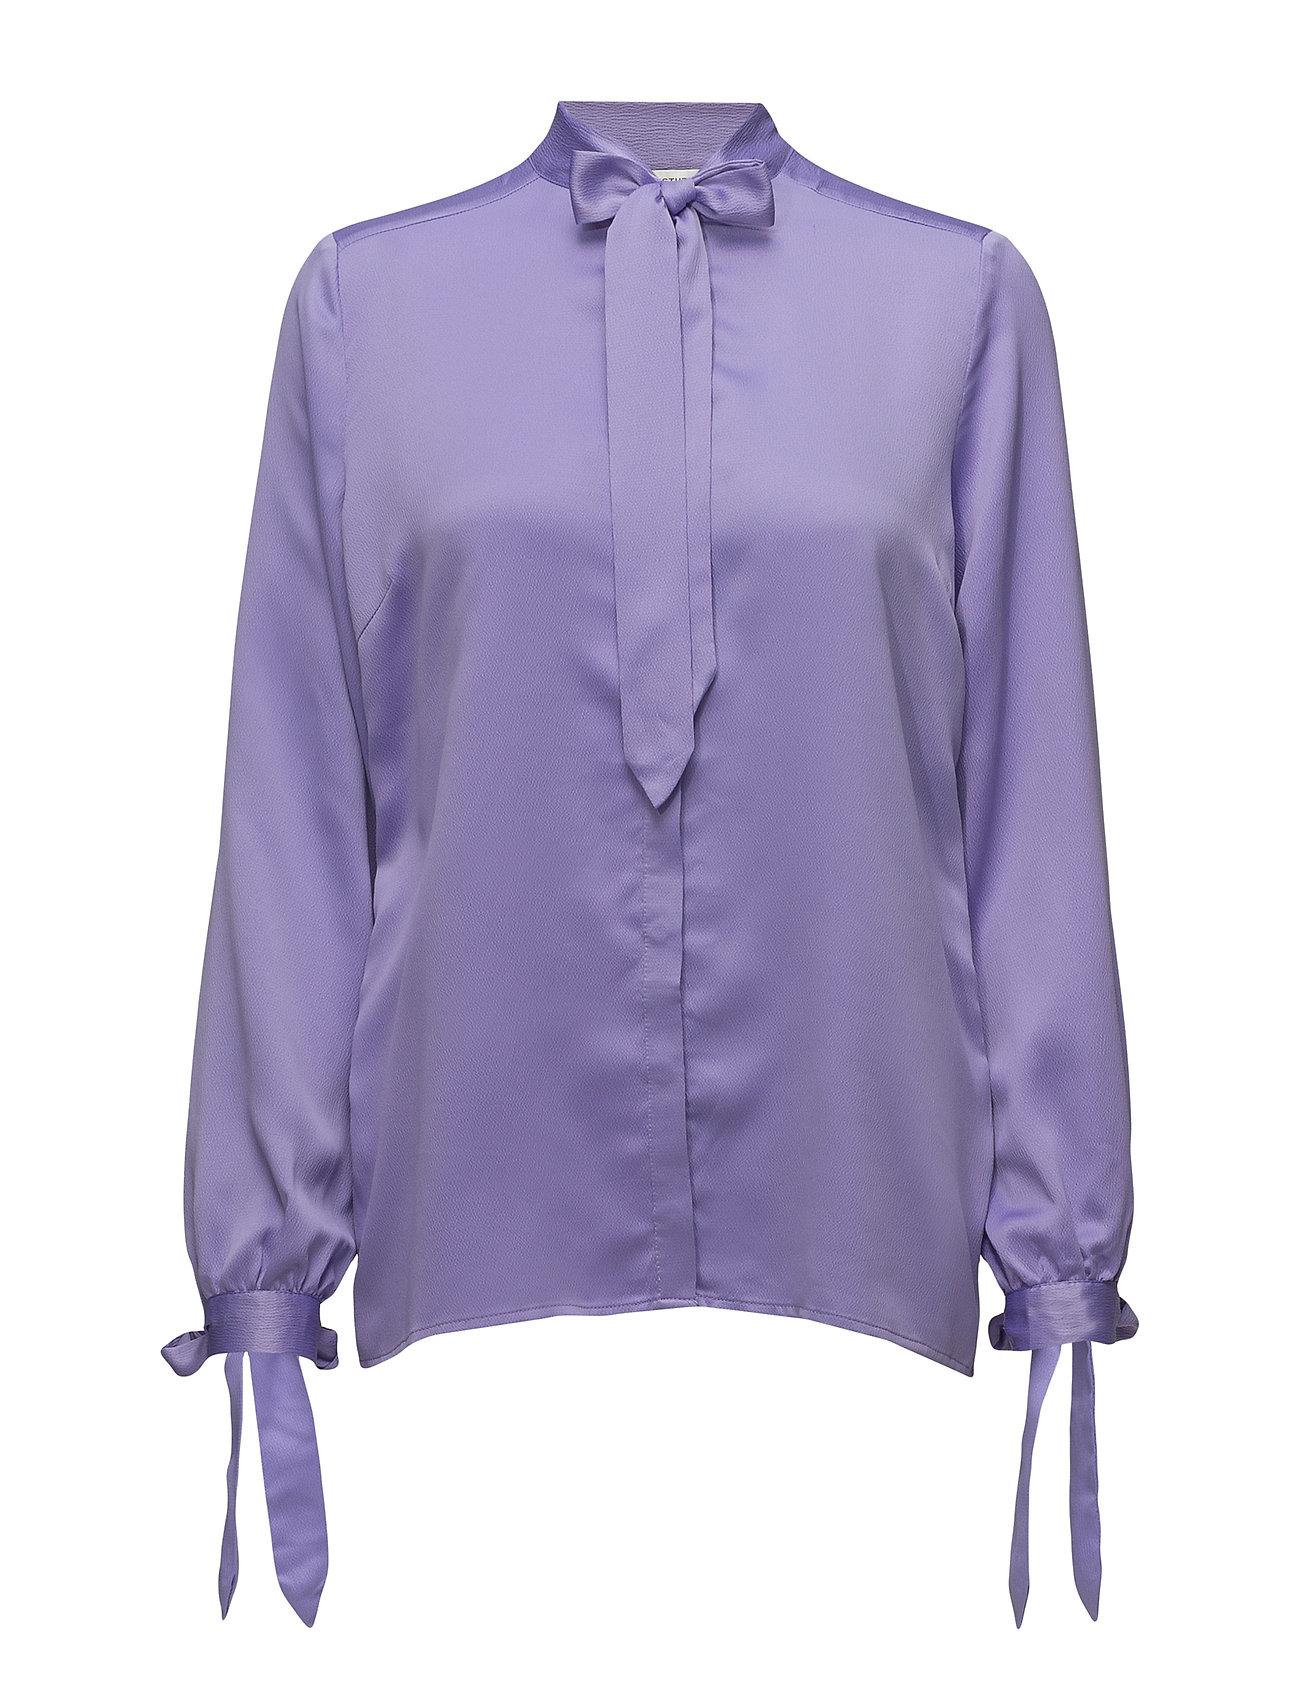 Mimi VerbenaGestuz Mimi VerbenaGestuz Shirt Ma18sand Mimi Shirt Shirt Ma18sand fvgb7y6Y